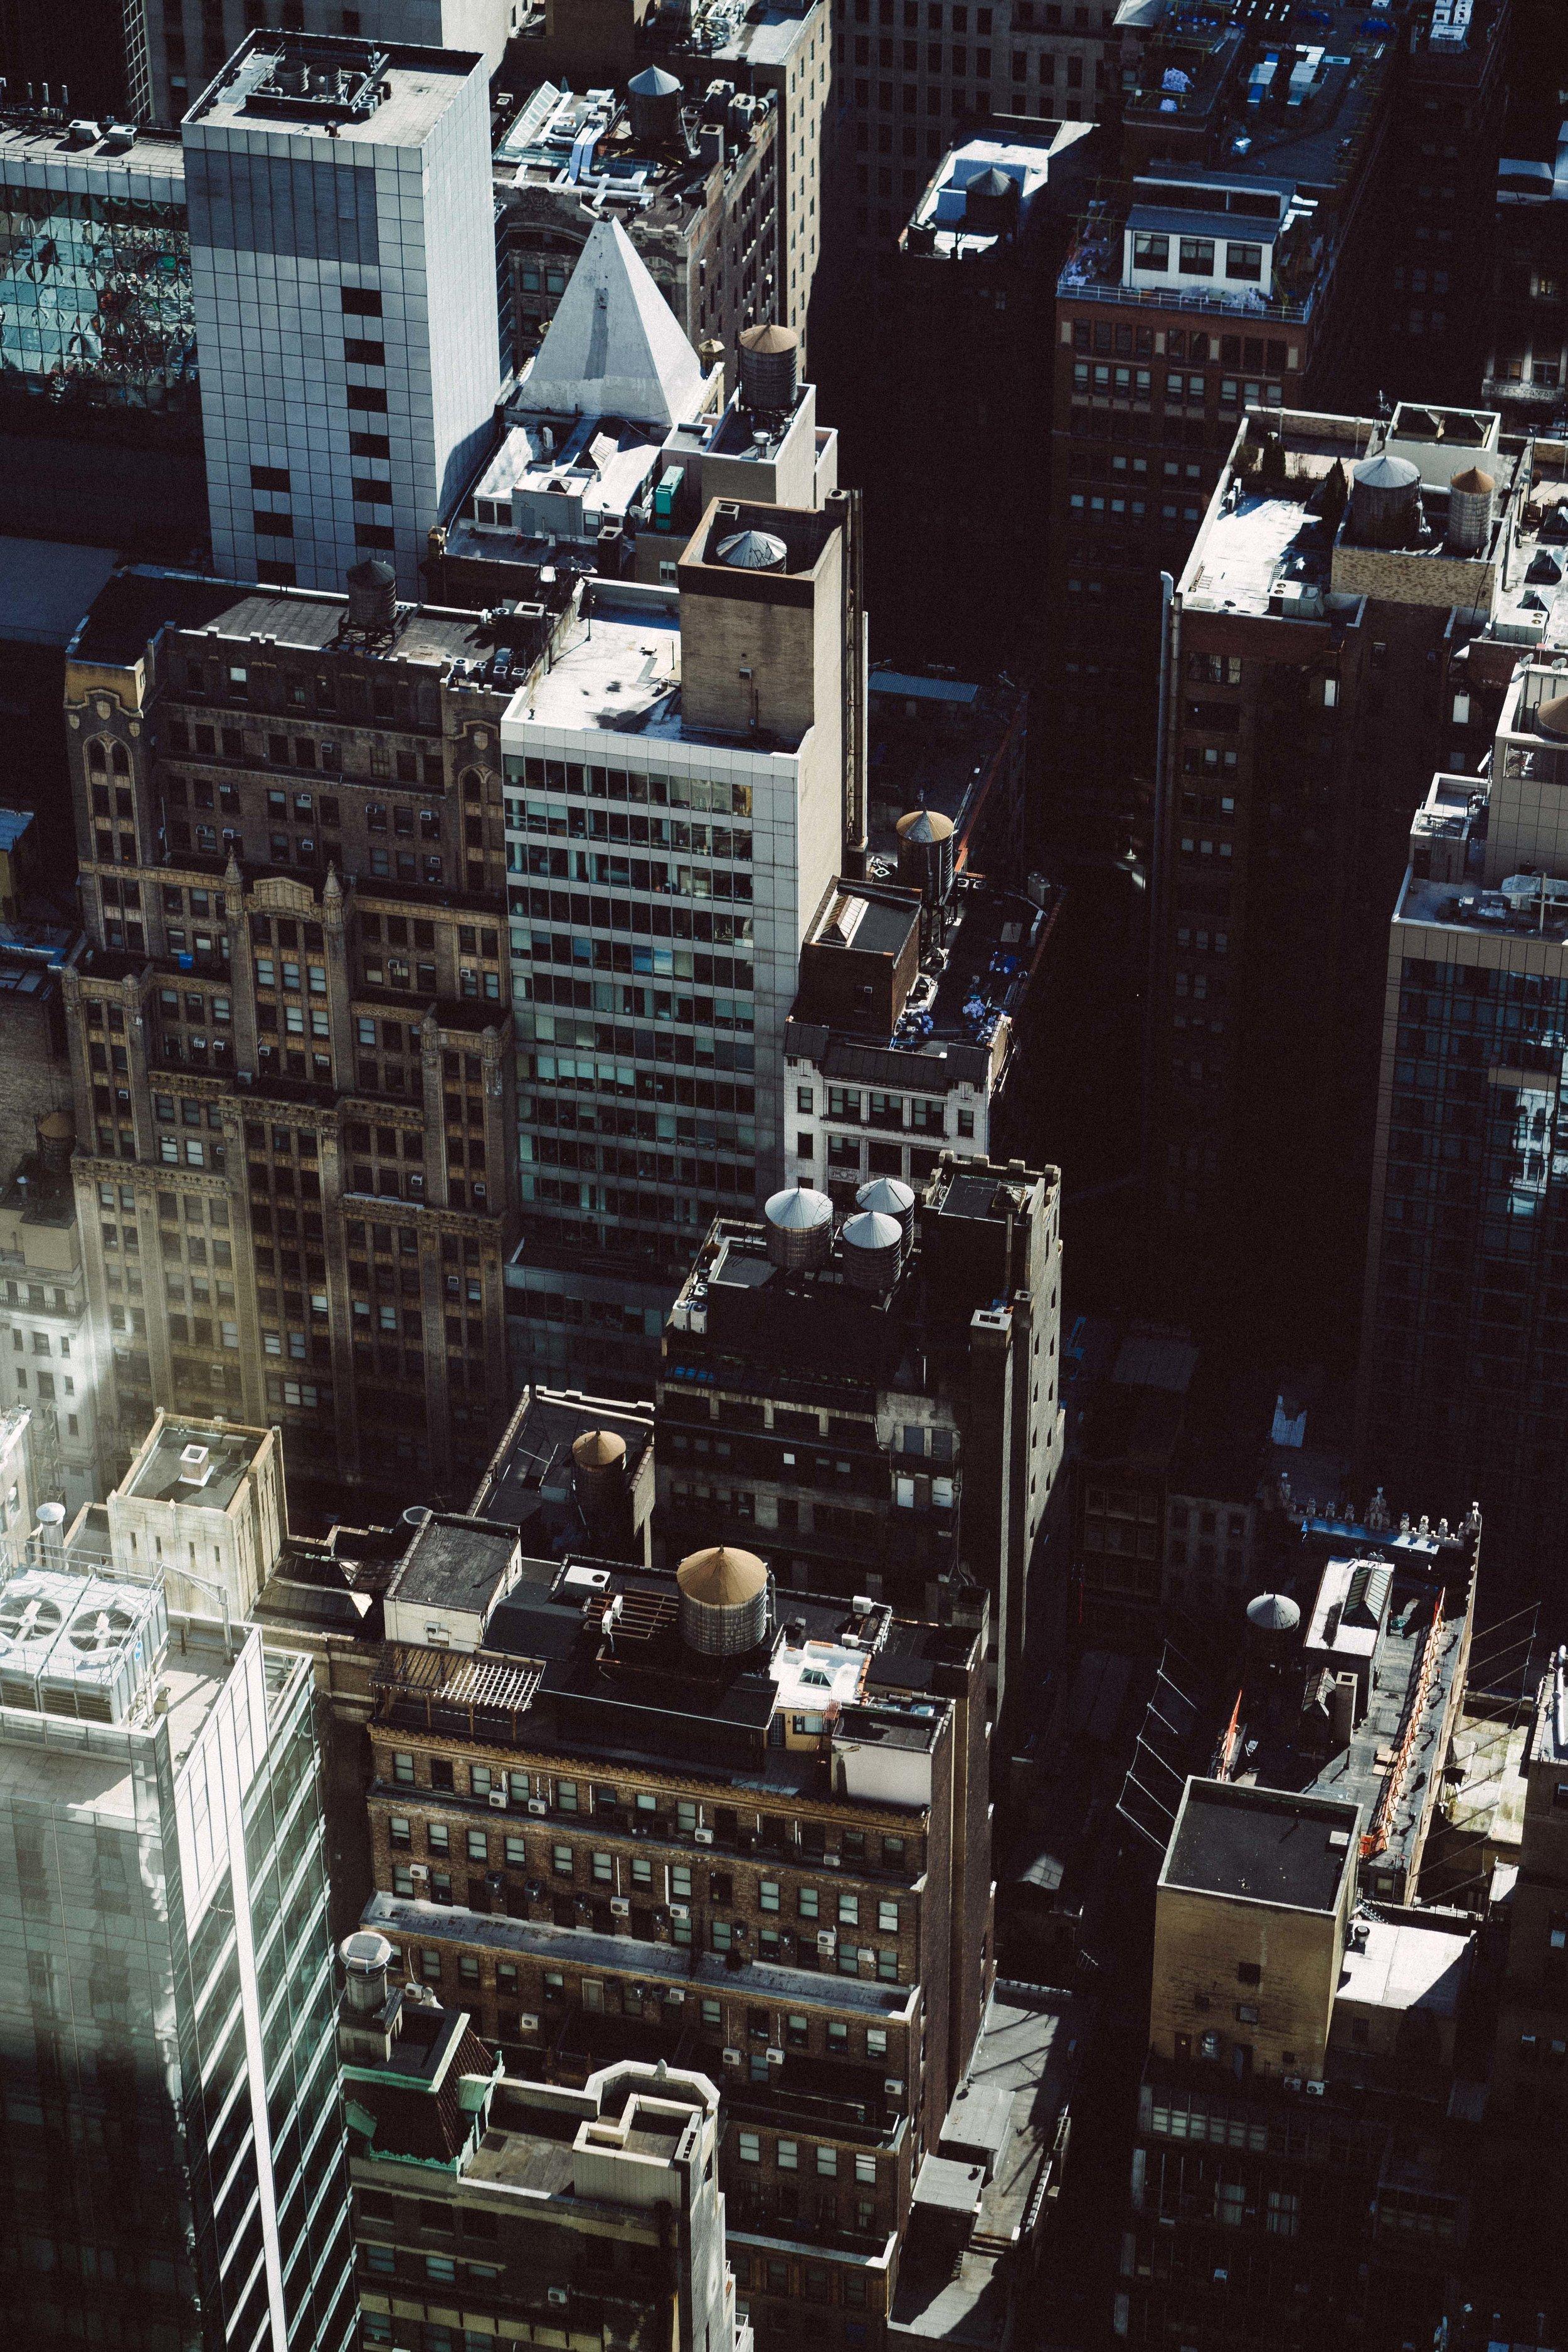 newyork-sony-103263.jpg